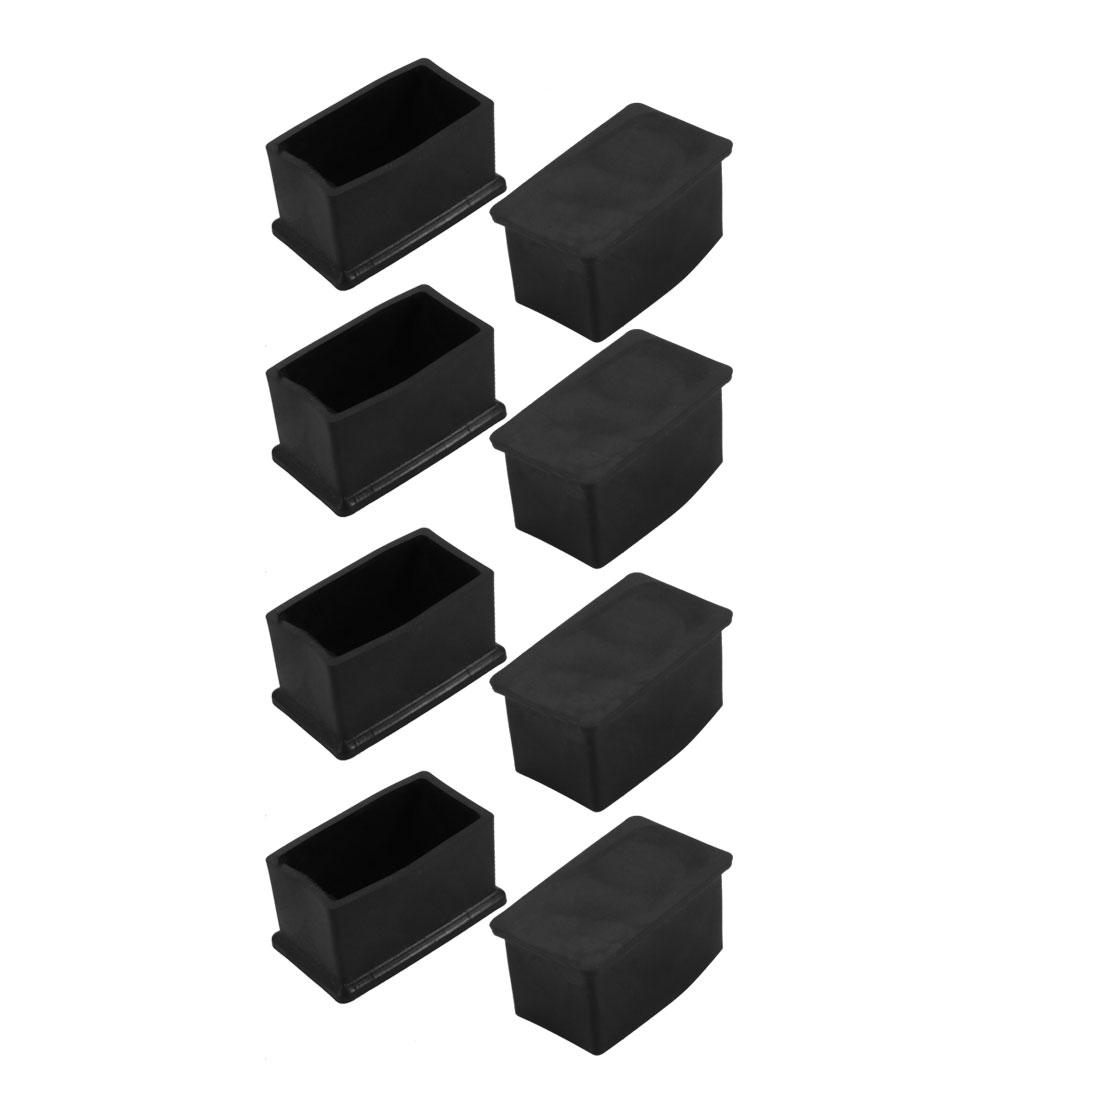 8pcs 23x48mm Black PVC Rubber Rectangle Cabinet Leg Insert Cover Protector